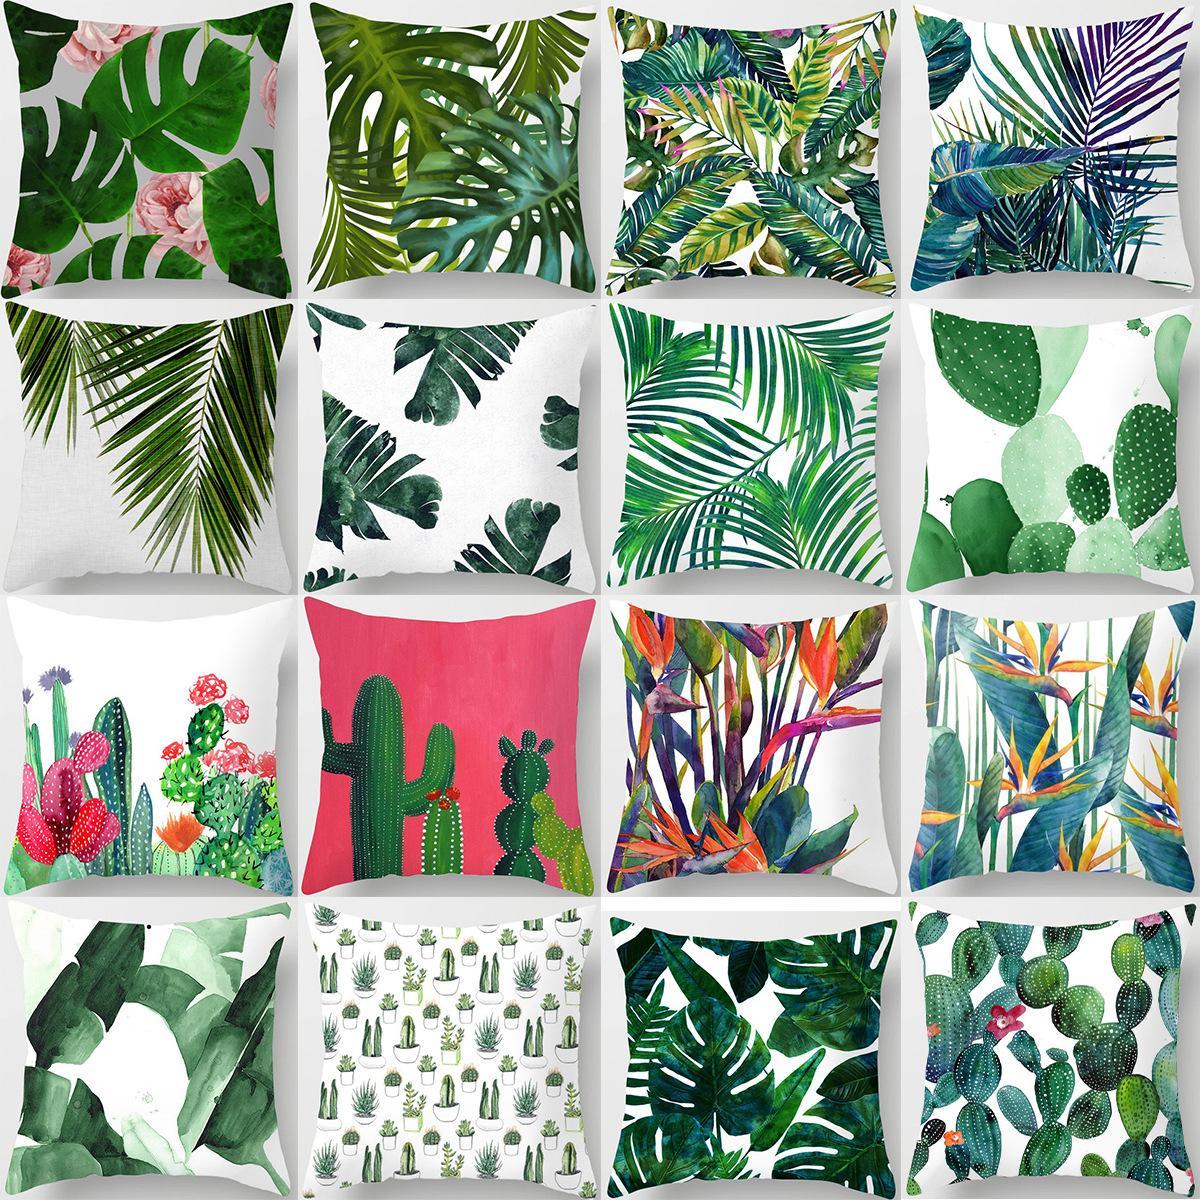 Tropical Plants Cushion Cover Cactus Flower Sofa Office Car Decorative Pillowcase Peach Skin Covers Home Living Room Decor 45x45